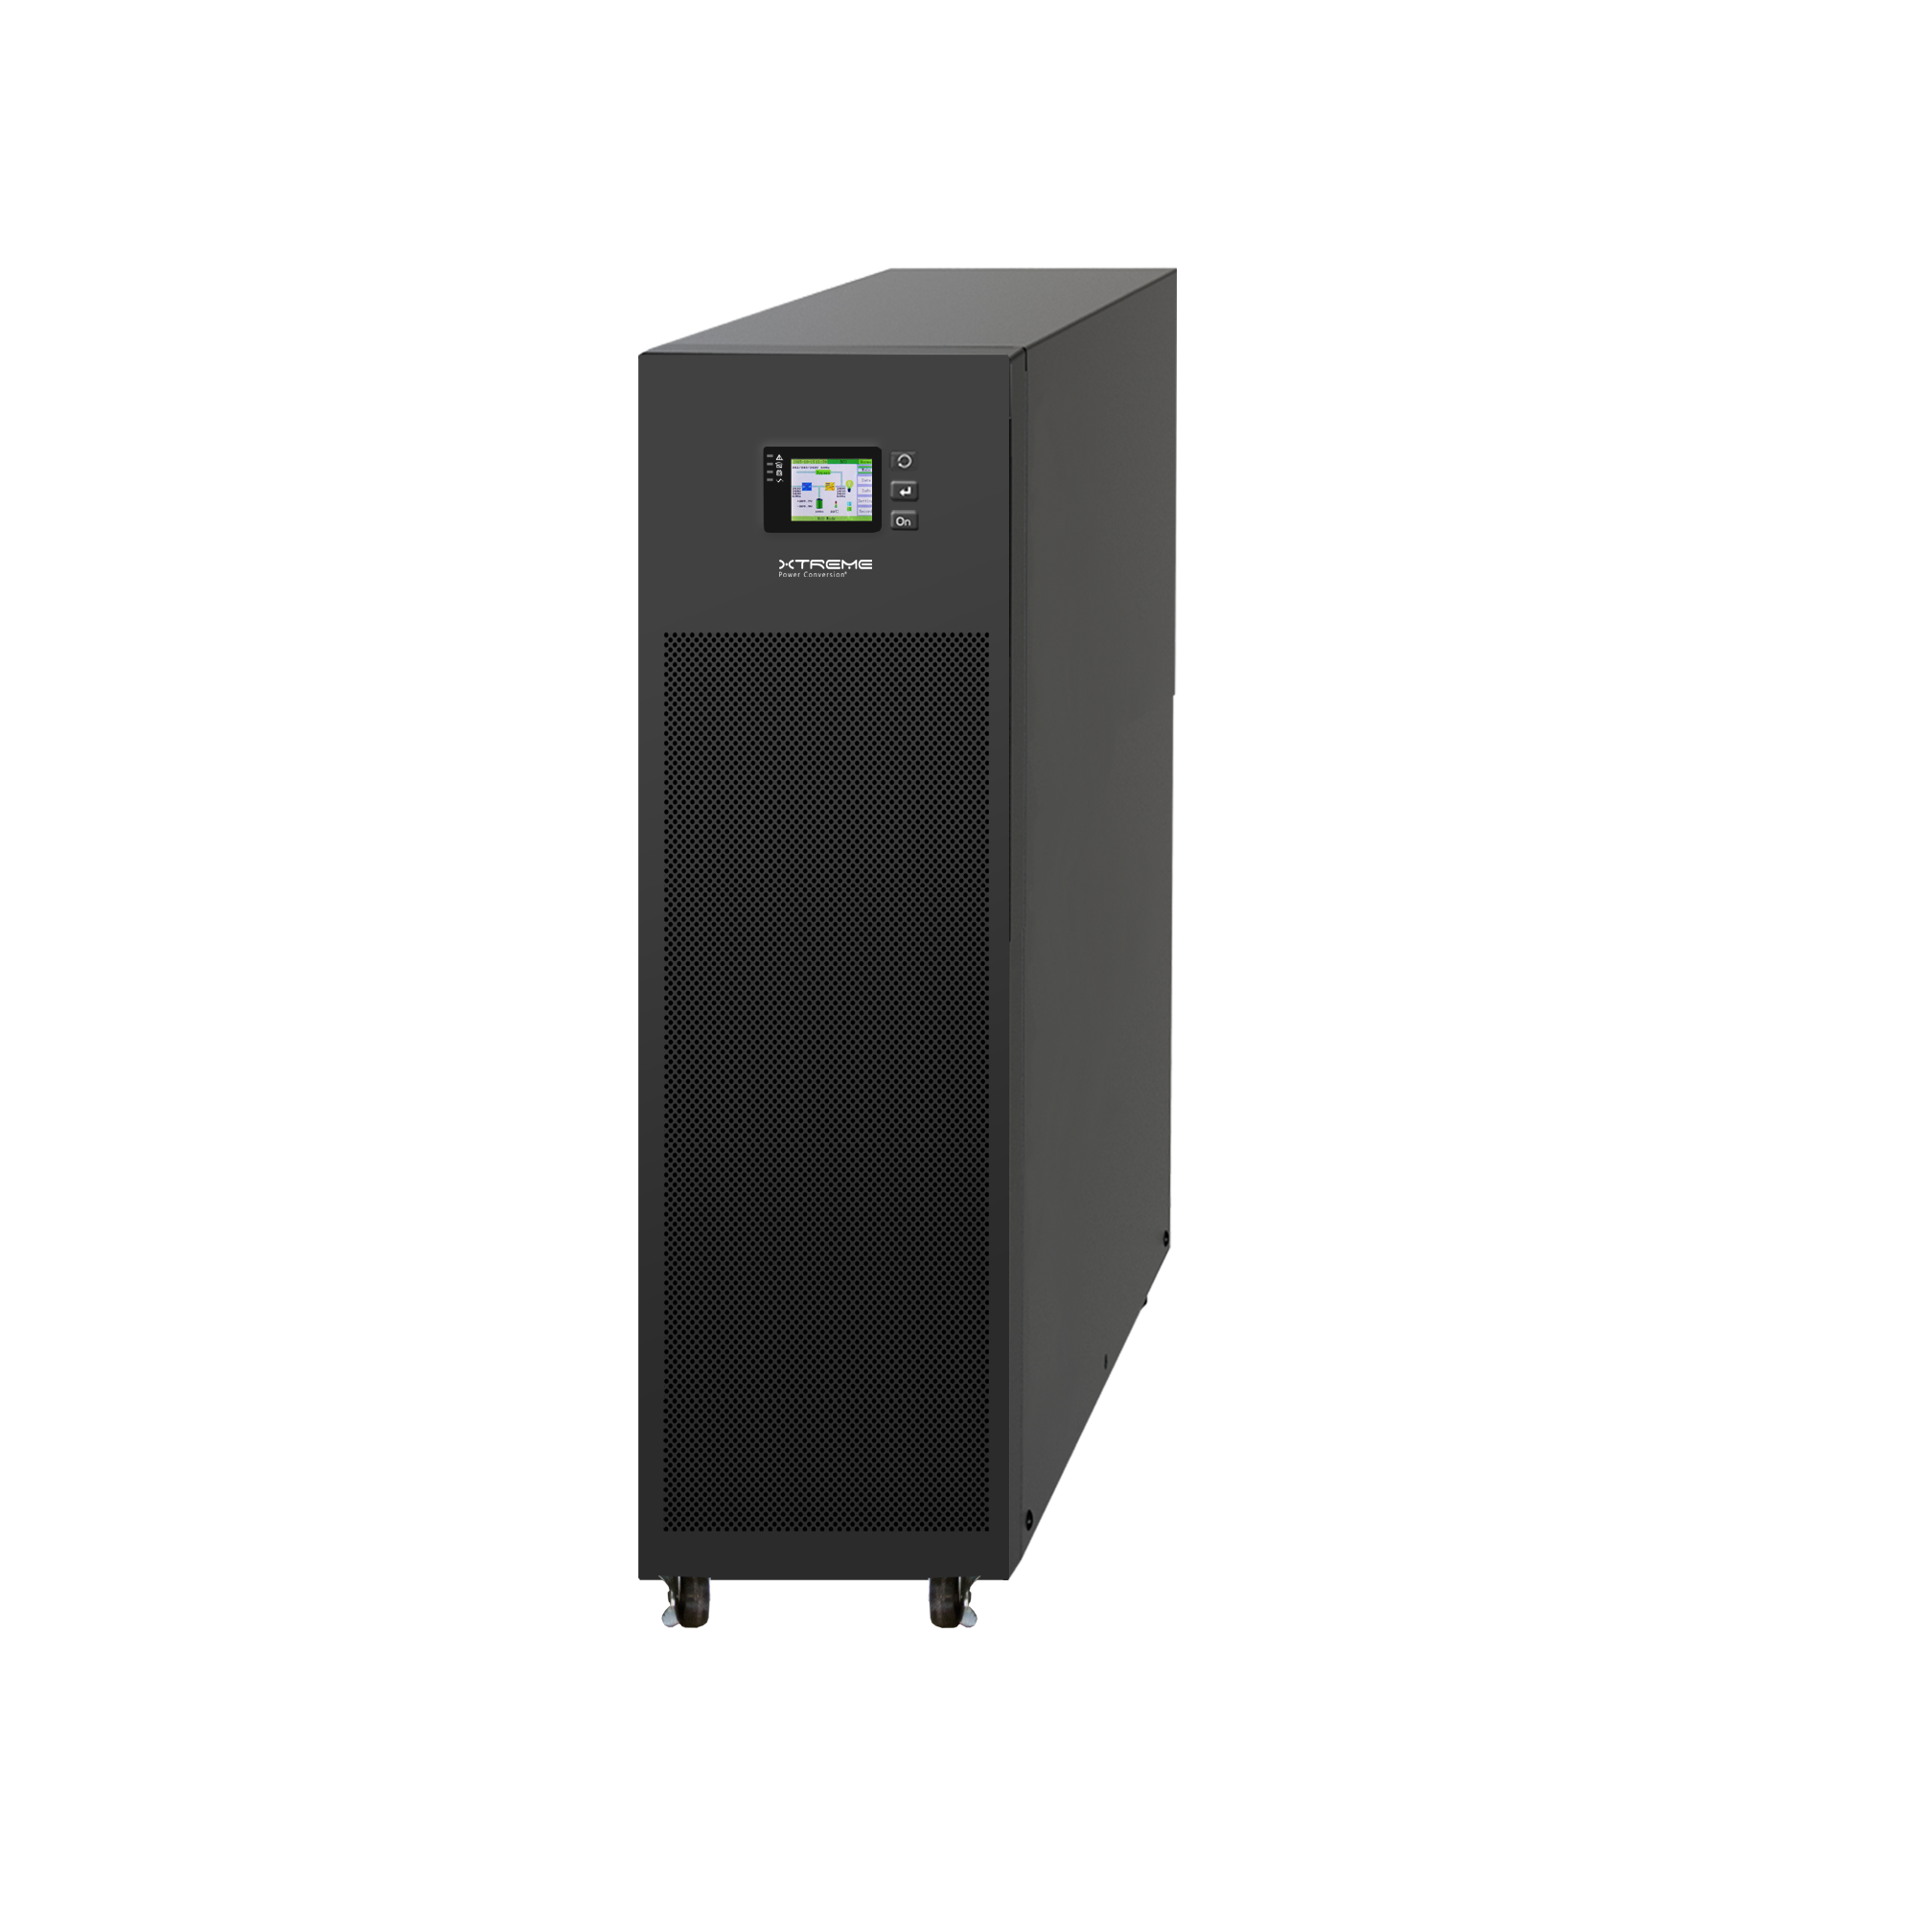 E90 Online UPS